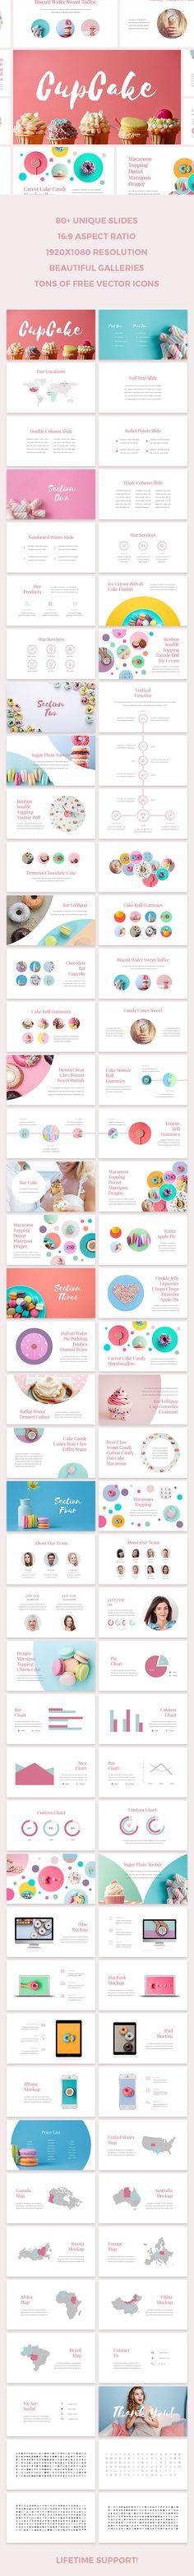 CupCake Keynote Template #marketing #cute • Download ➝ https://graphicriver.net/item/cupcake-keynote-template/18038367?ref=pxcr